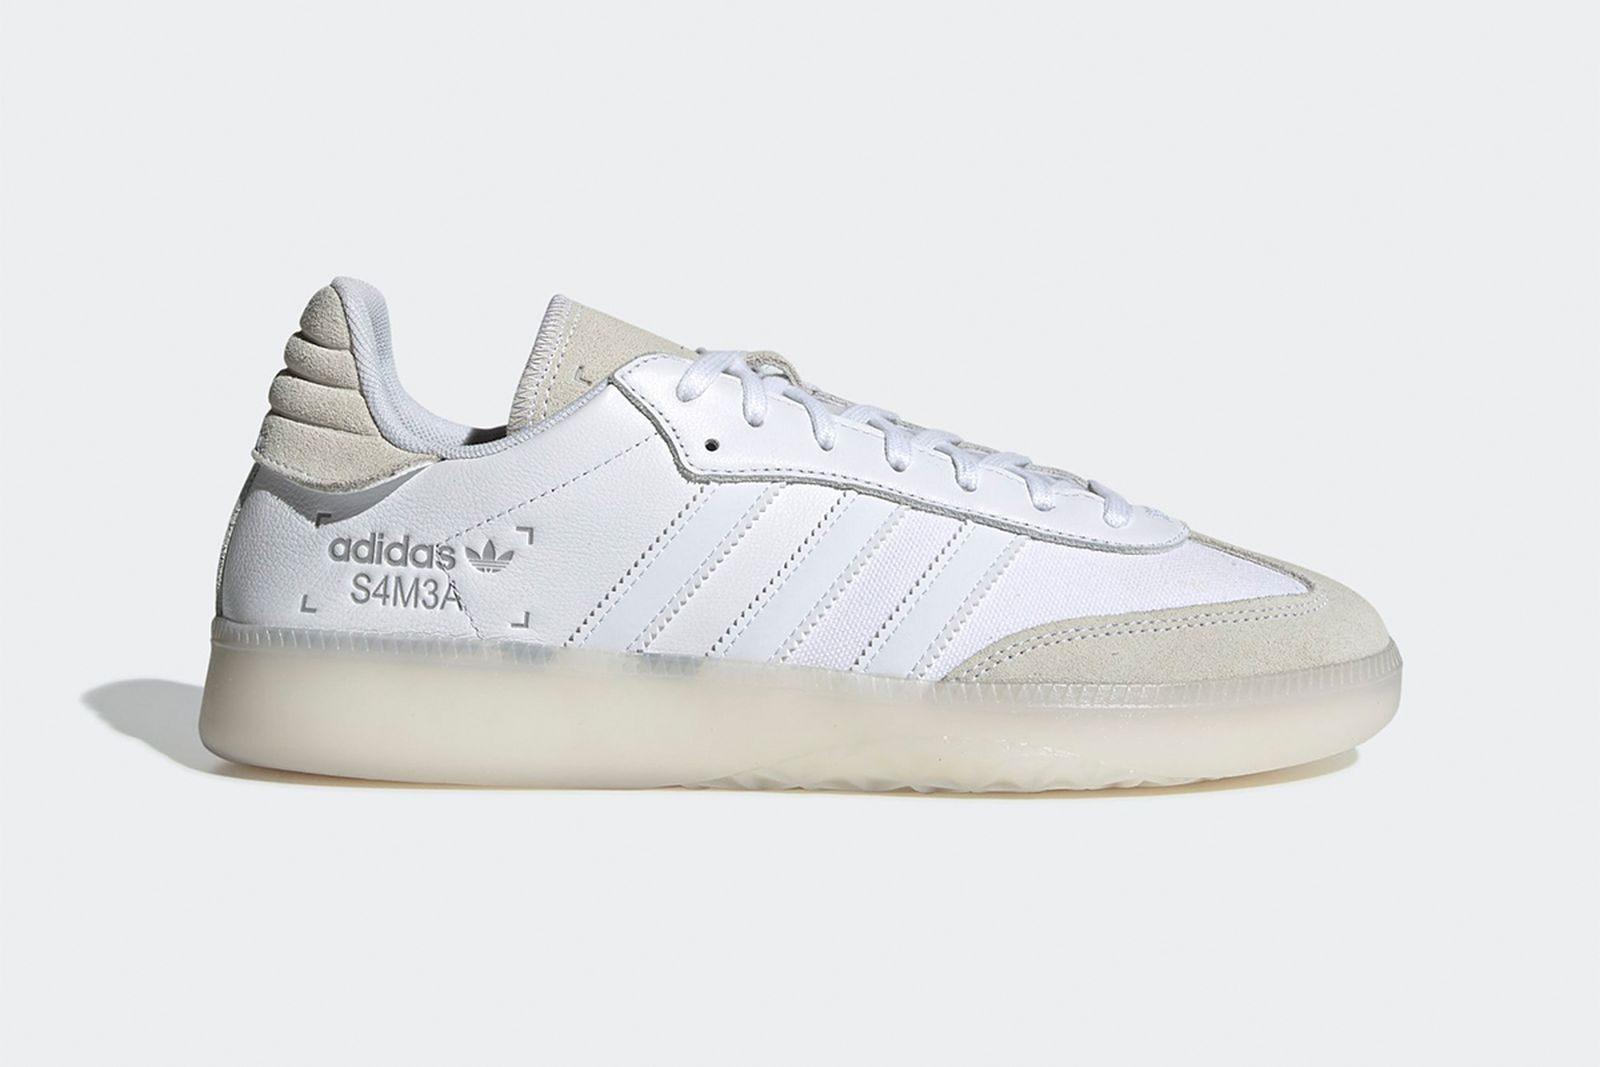 adidas samba rm cloud white core black release date price